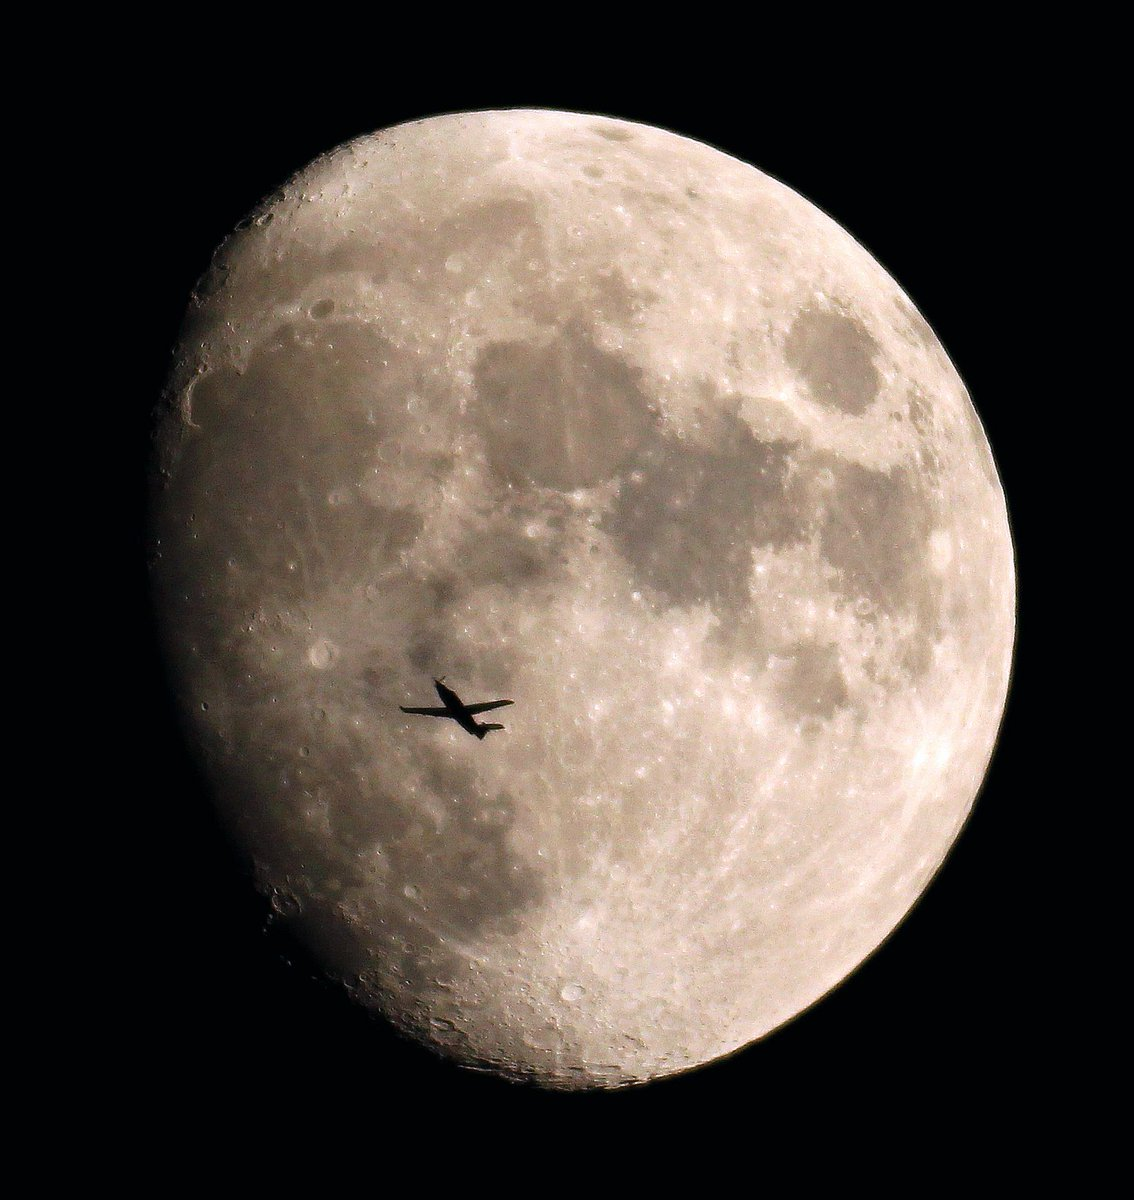 Great #Airplanes shot: #Swiss @PilatusAircraft #Pilatus 🇨🇭 #Moon from @lebribri #France #StunningFoto https://t.co/BvrOW0f8ja #HANA